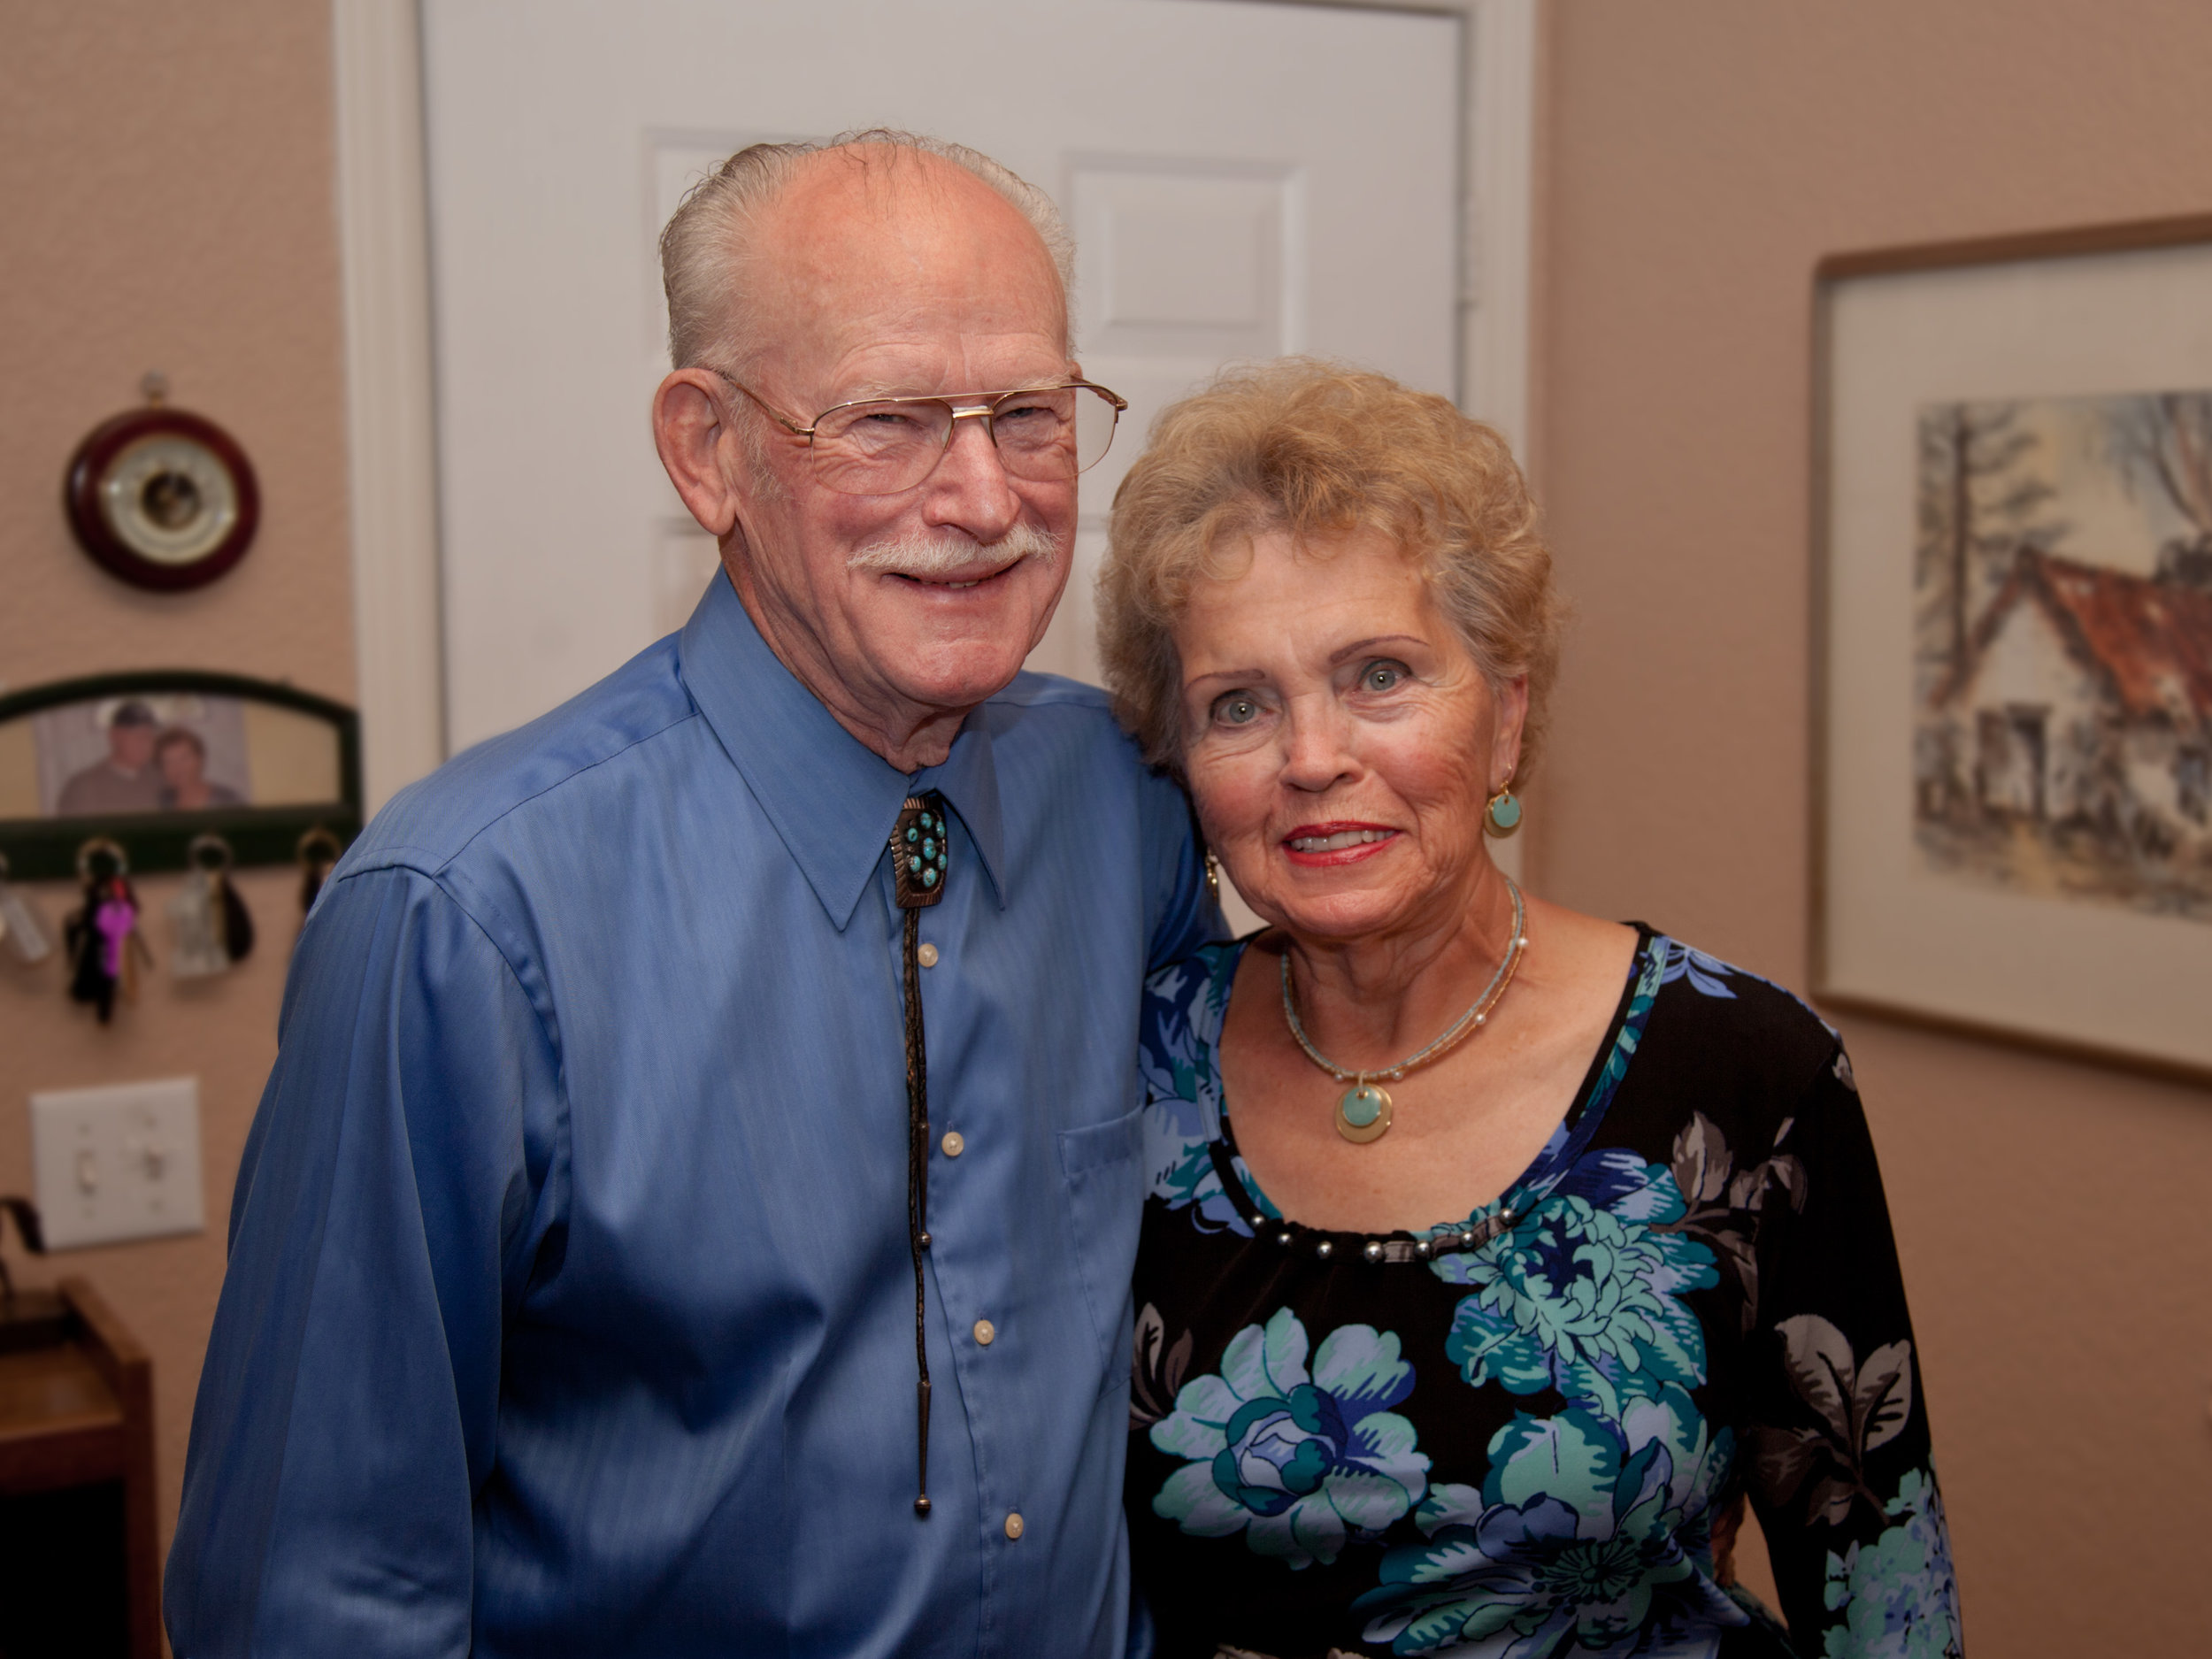 person-people-senior-citizen-arizona-family-grandparent-286678-pxhere.com.jpg